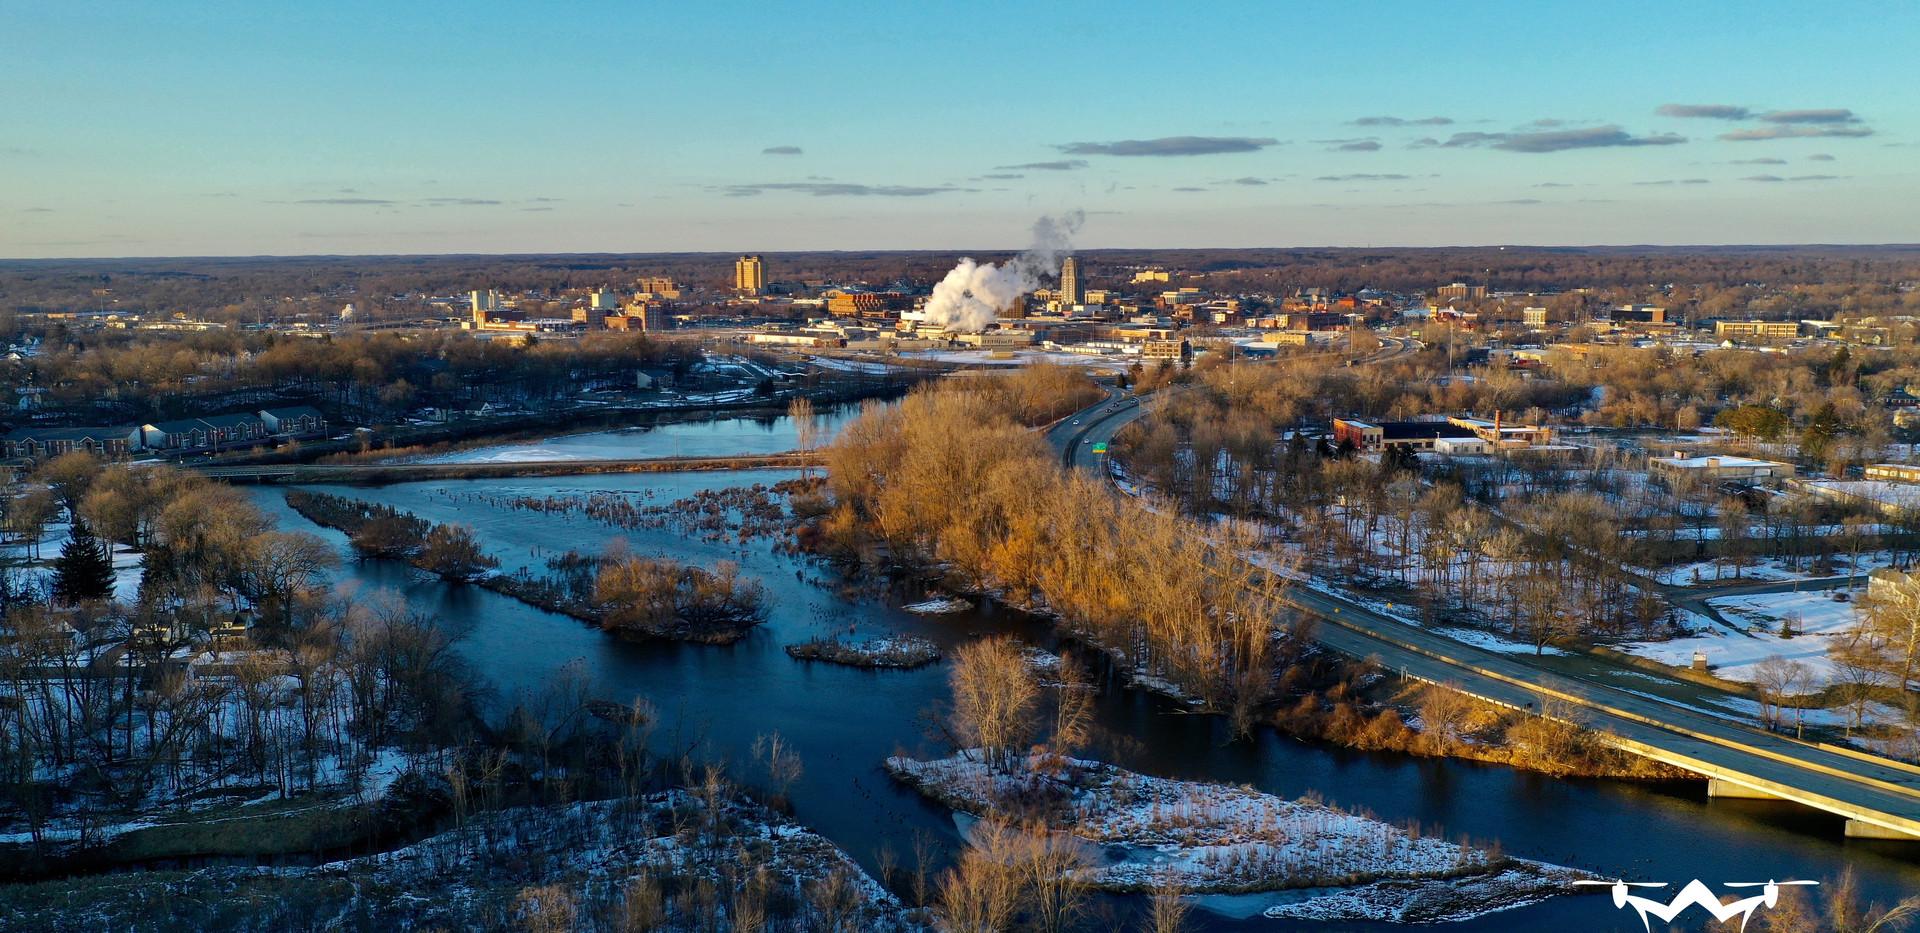 Battle Creek Overlook Drone Patman Droneography